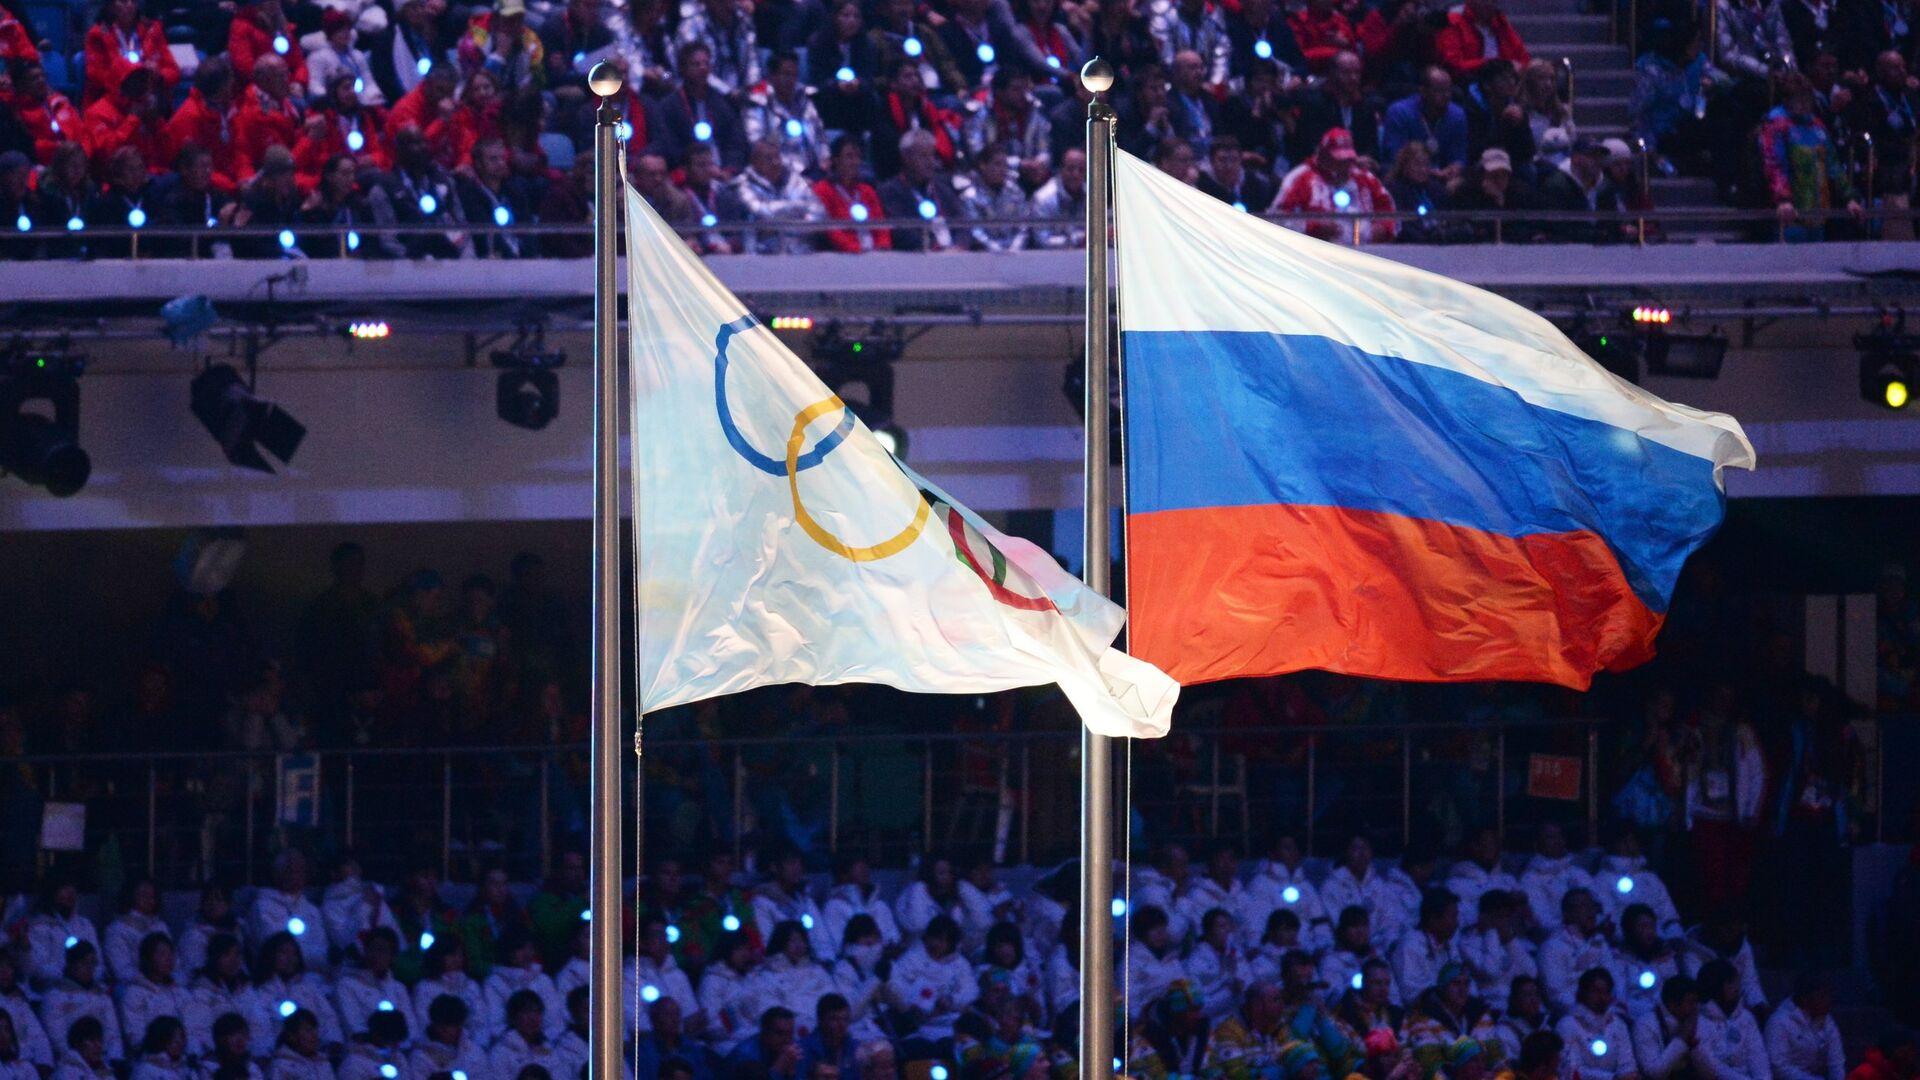 Олимпийский флаг и флаг России на Играх в Сочи - РИА Новости, 1920, 17.12.2020